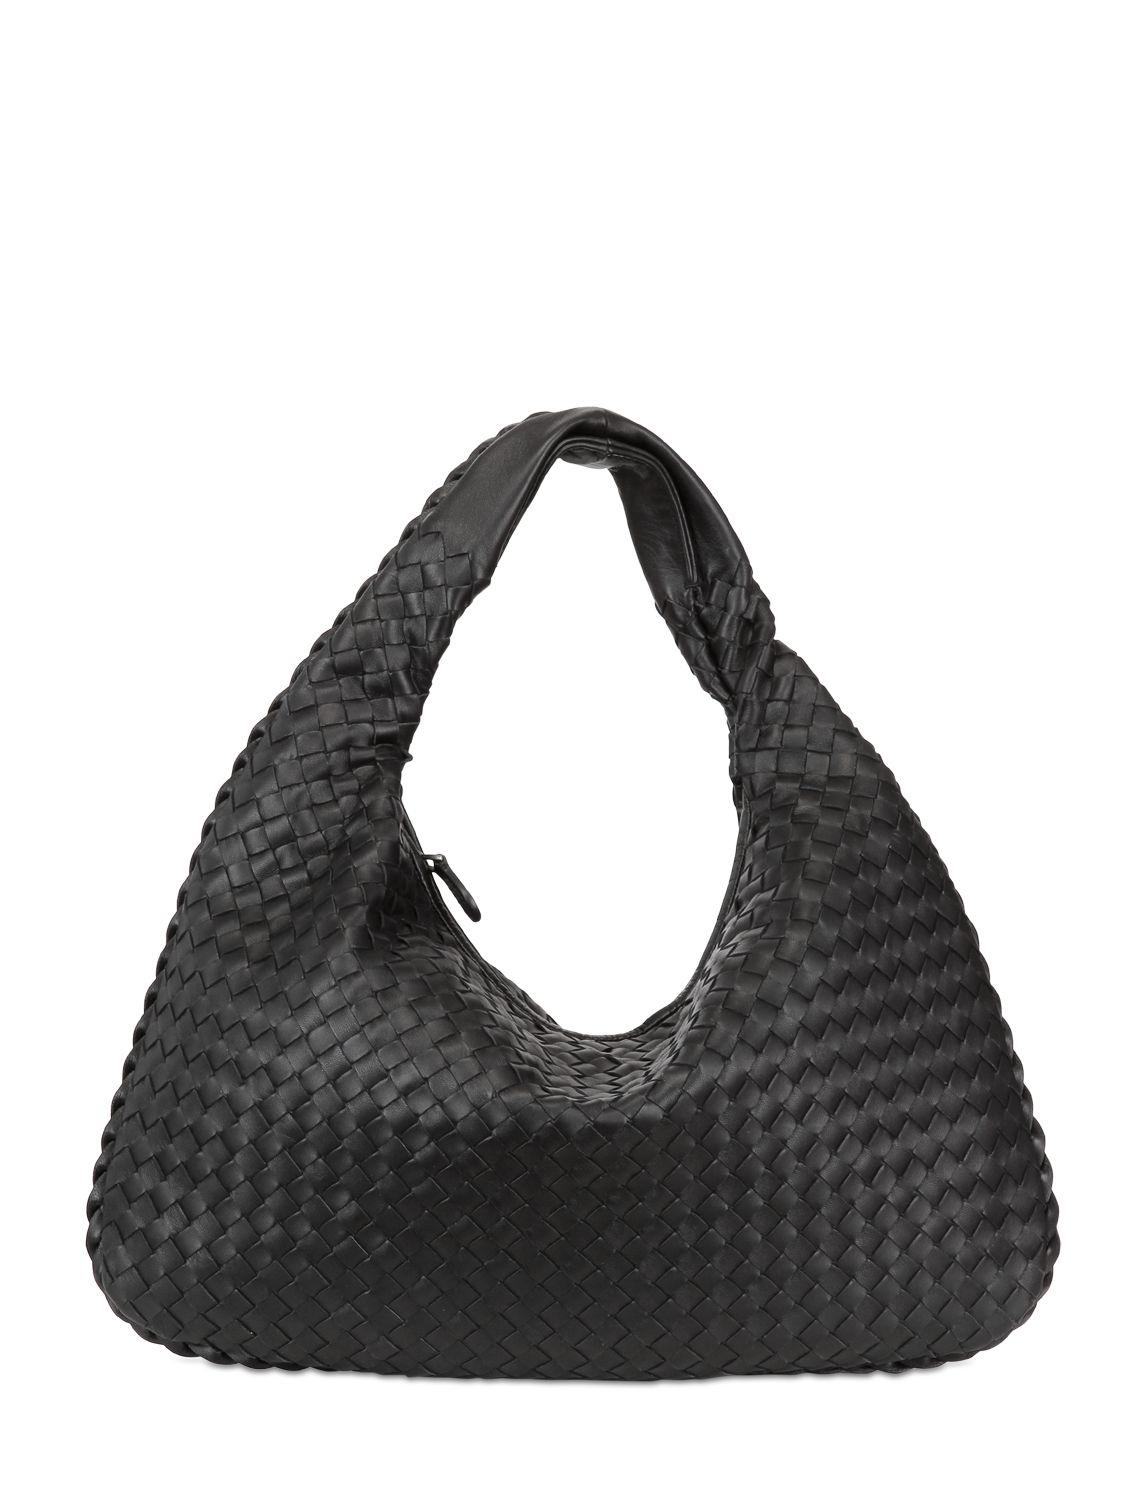 Lyst - Bottega Veneta Medium Veneta Intrecciato Leather Bag in Black b0efd014493f2